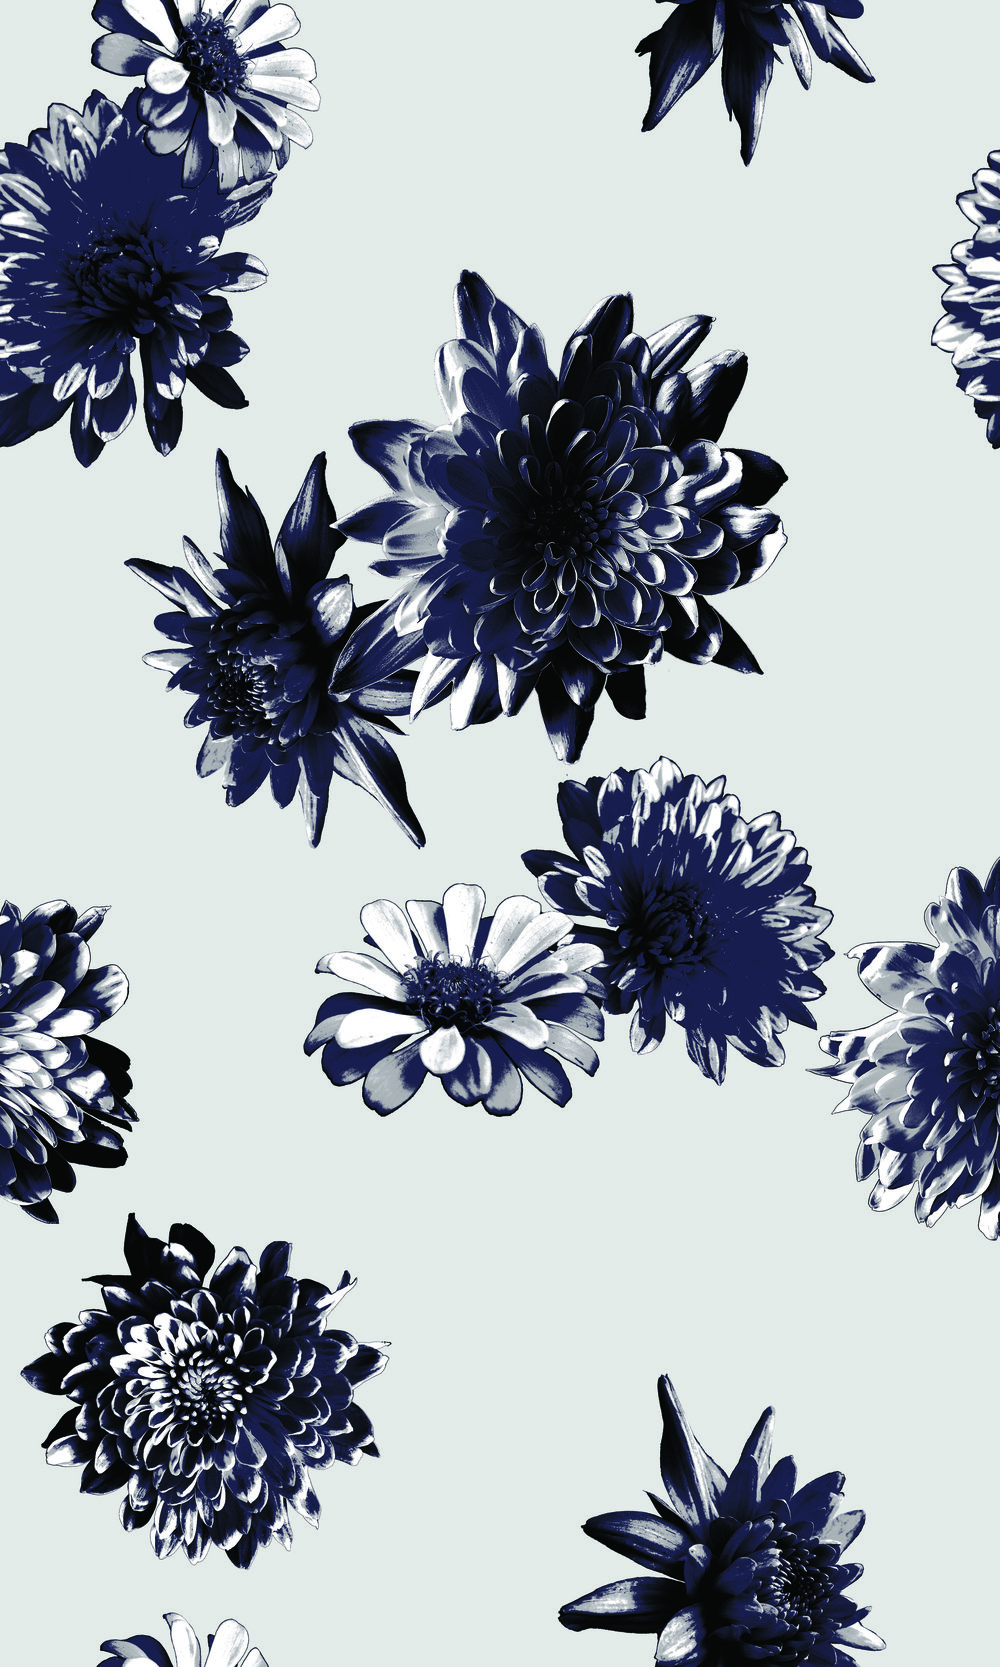 chrysanthemumScatter1.jpg